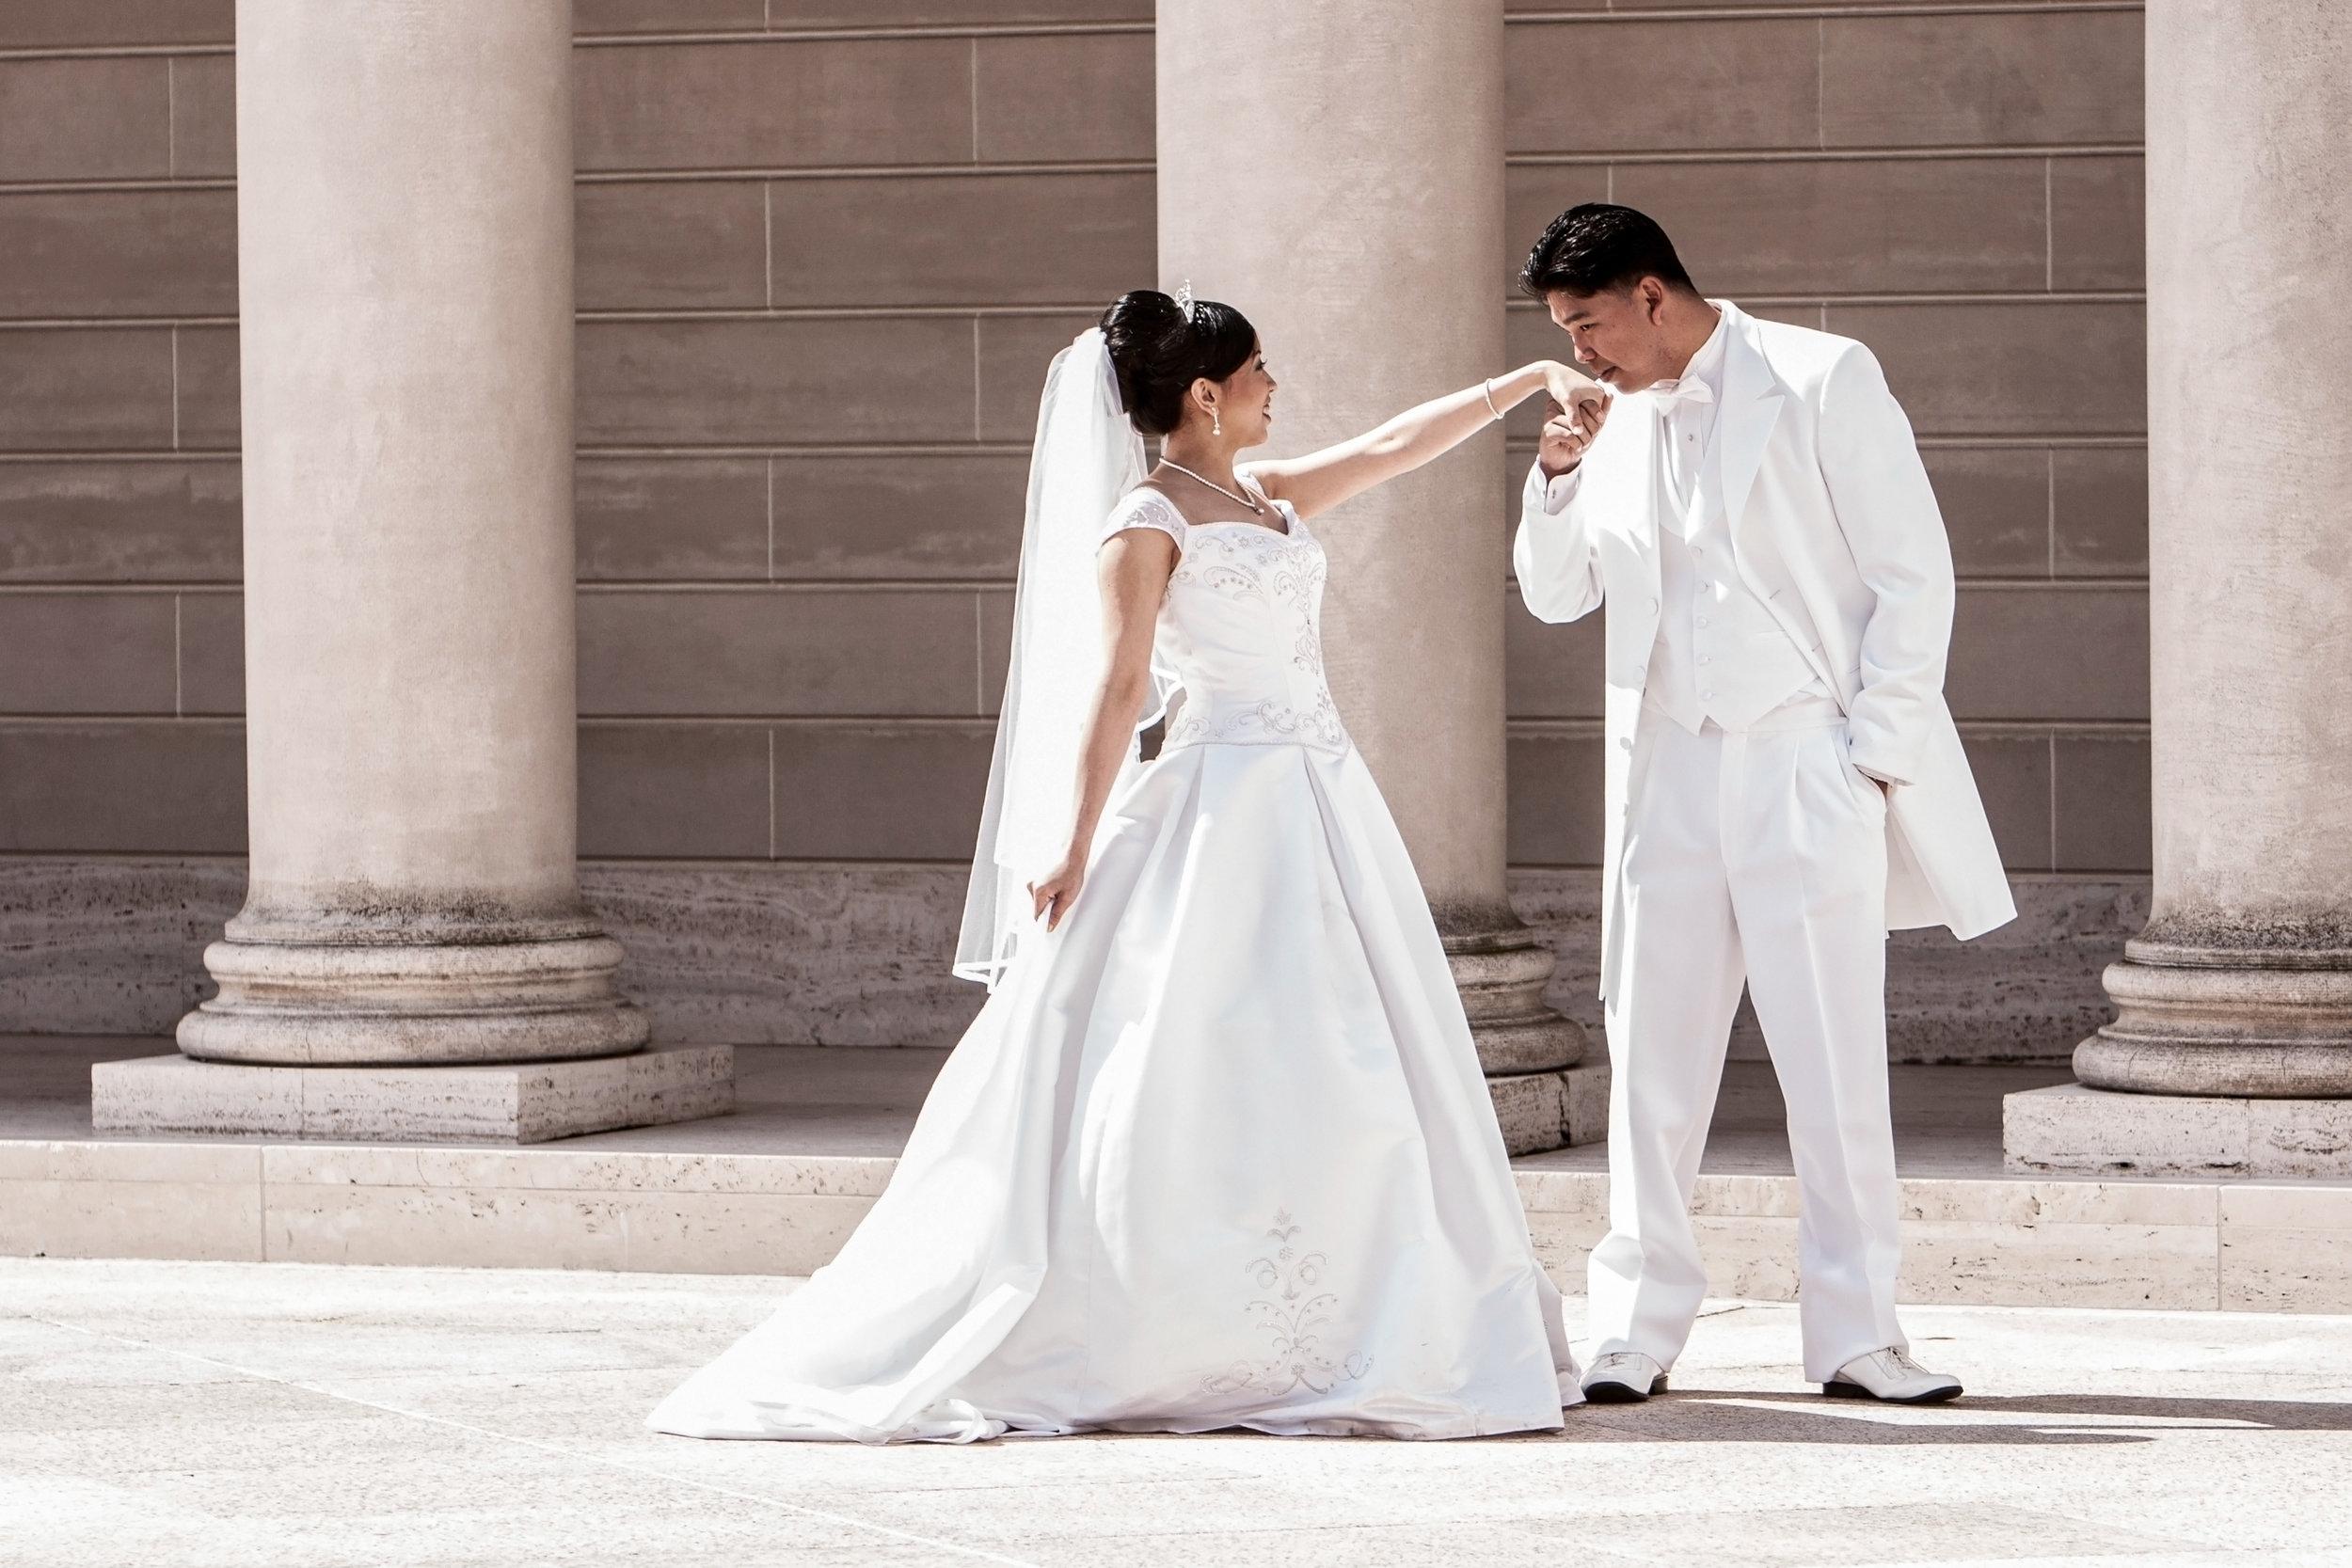 Wedding-Photography-Marin-County.jpg